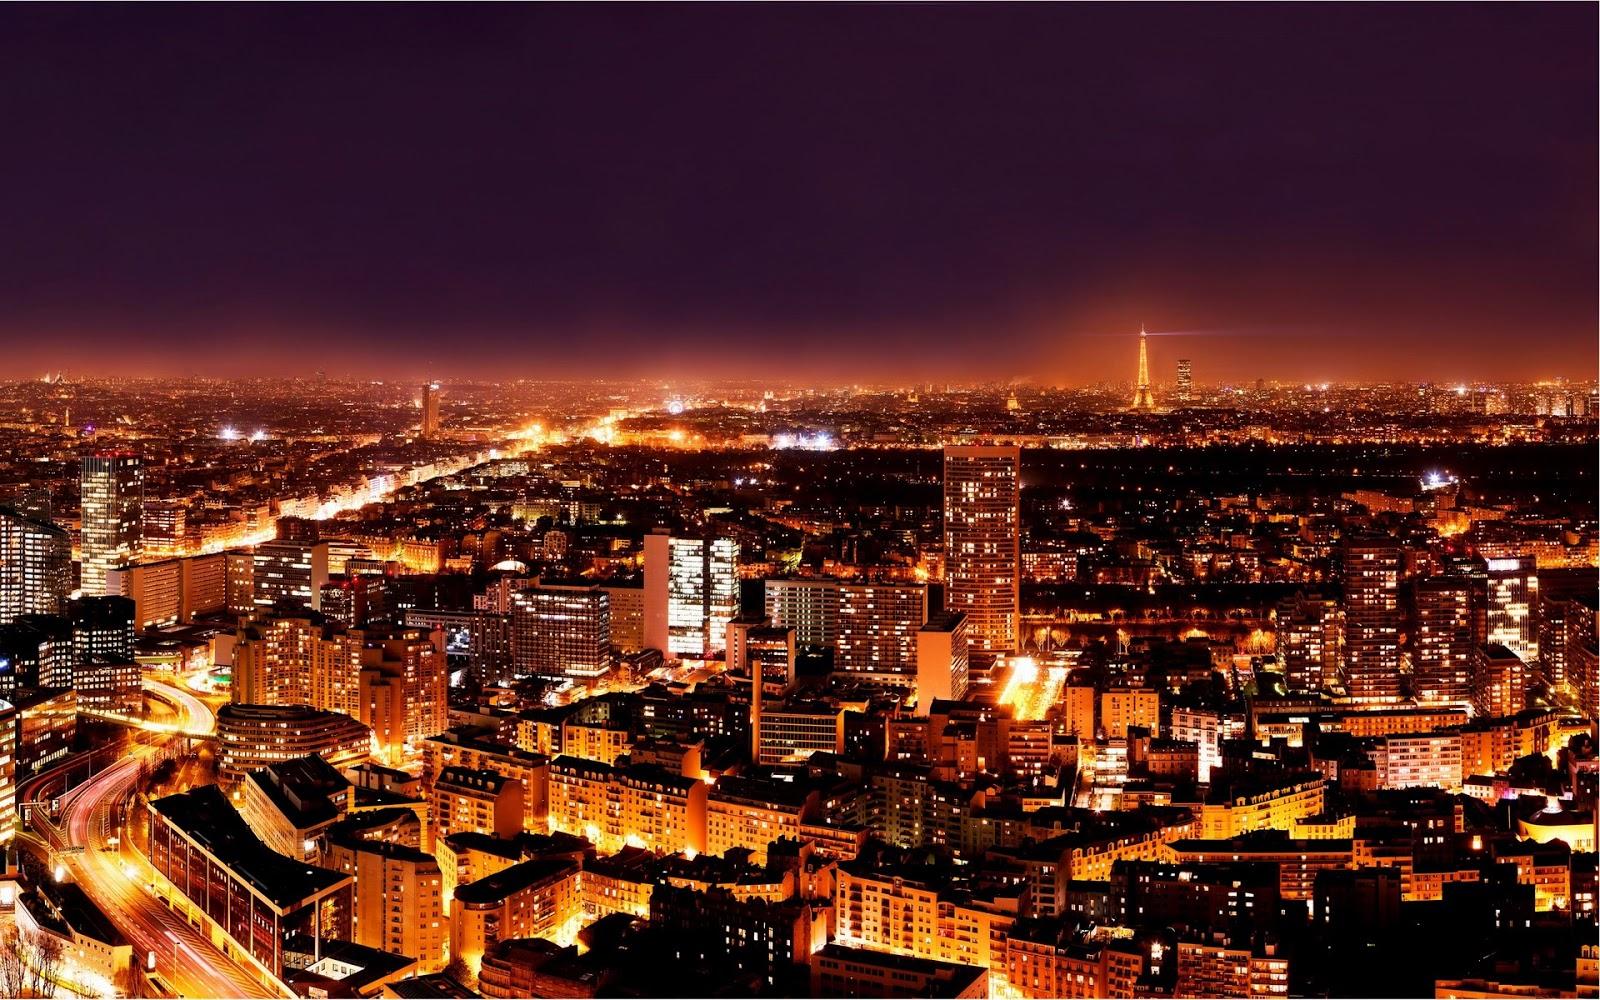 Paris Paris at Night Wallpaper 1600x1000